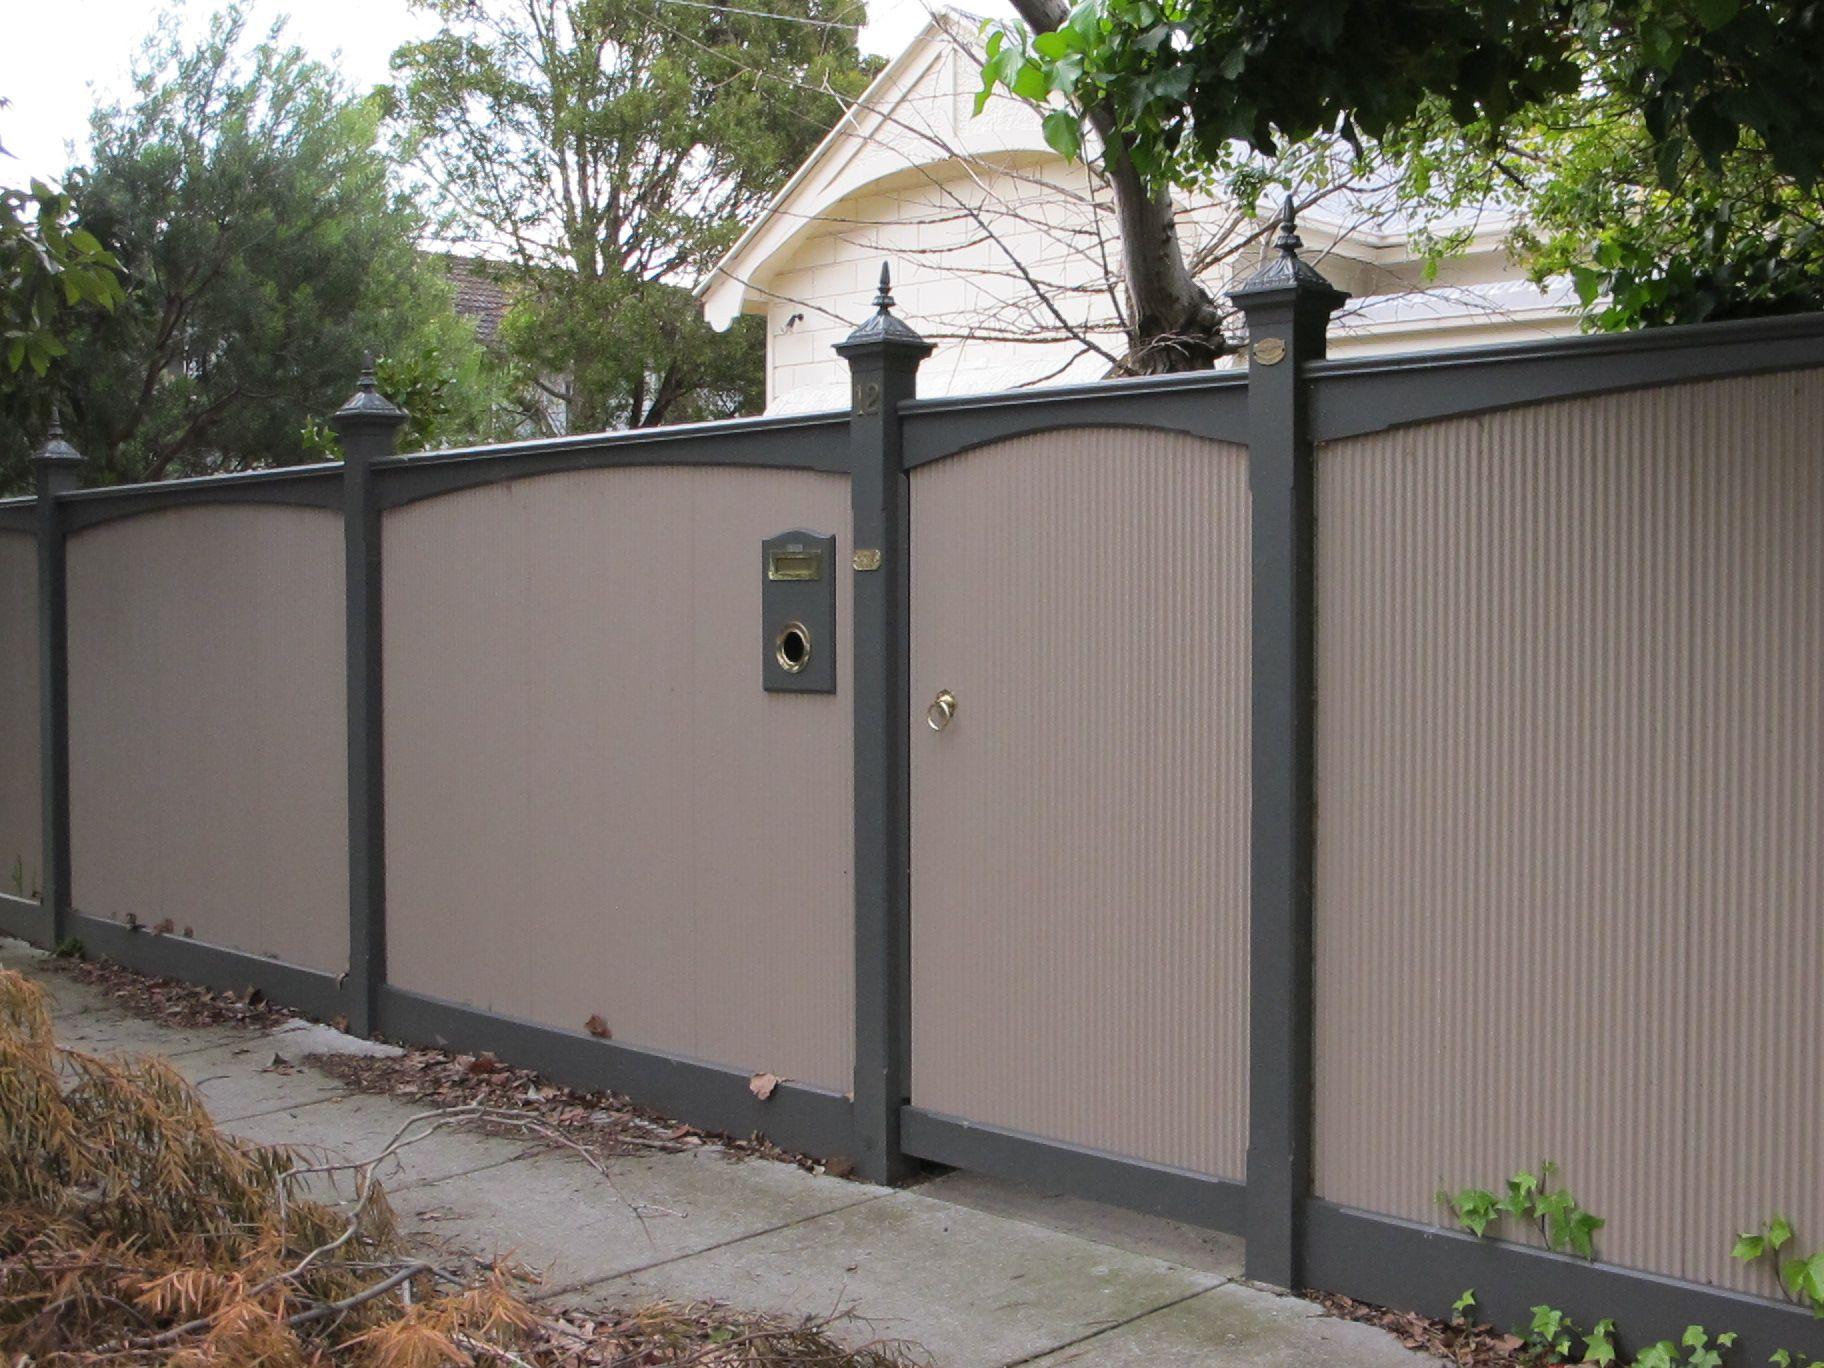 Wonderful Sheet Metal Fence Image Of Corrugated Throughout Design Inspiration